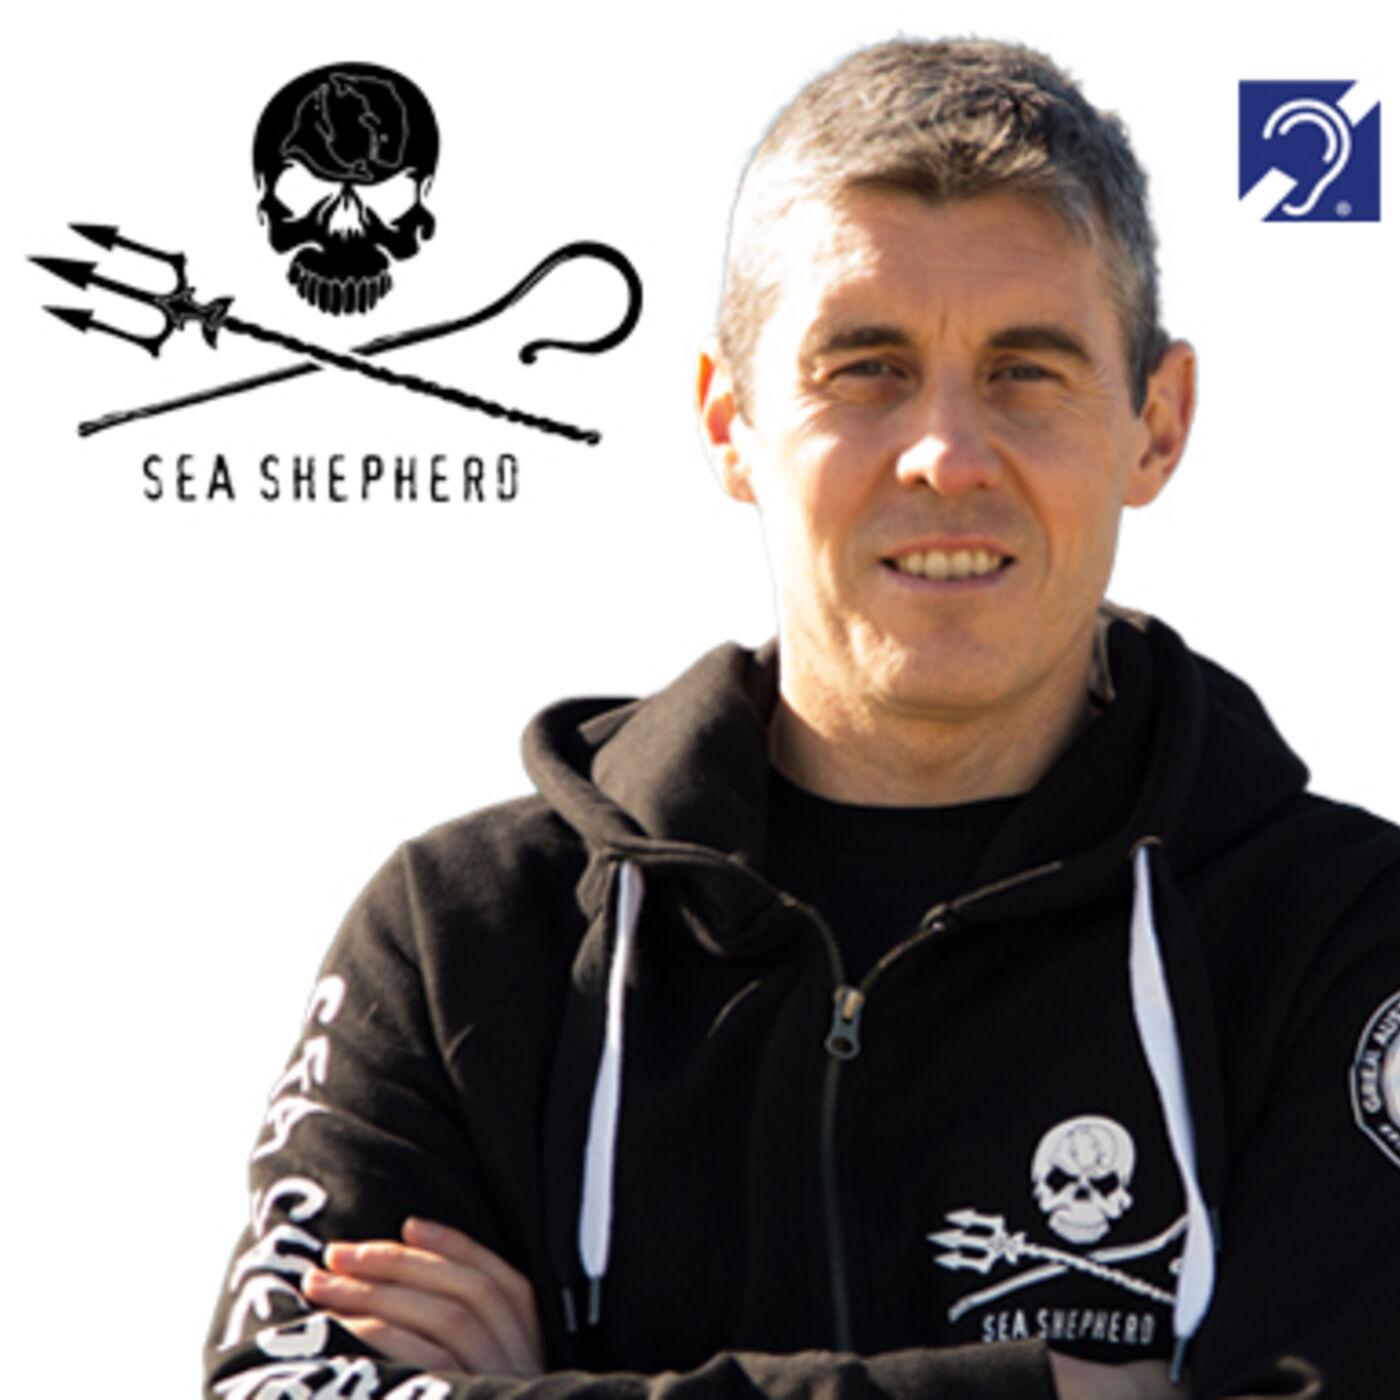 Jeff Hansen - Sea Shepherd Global Director - S02 E06